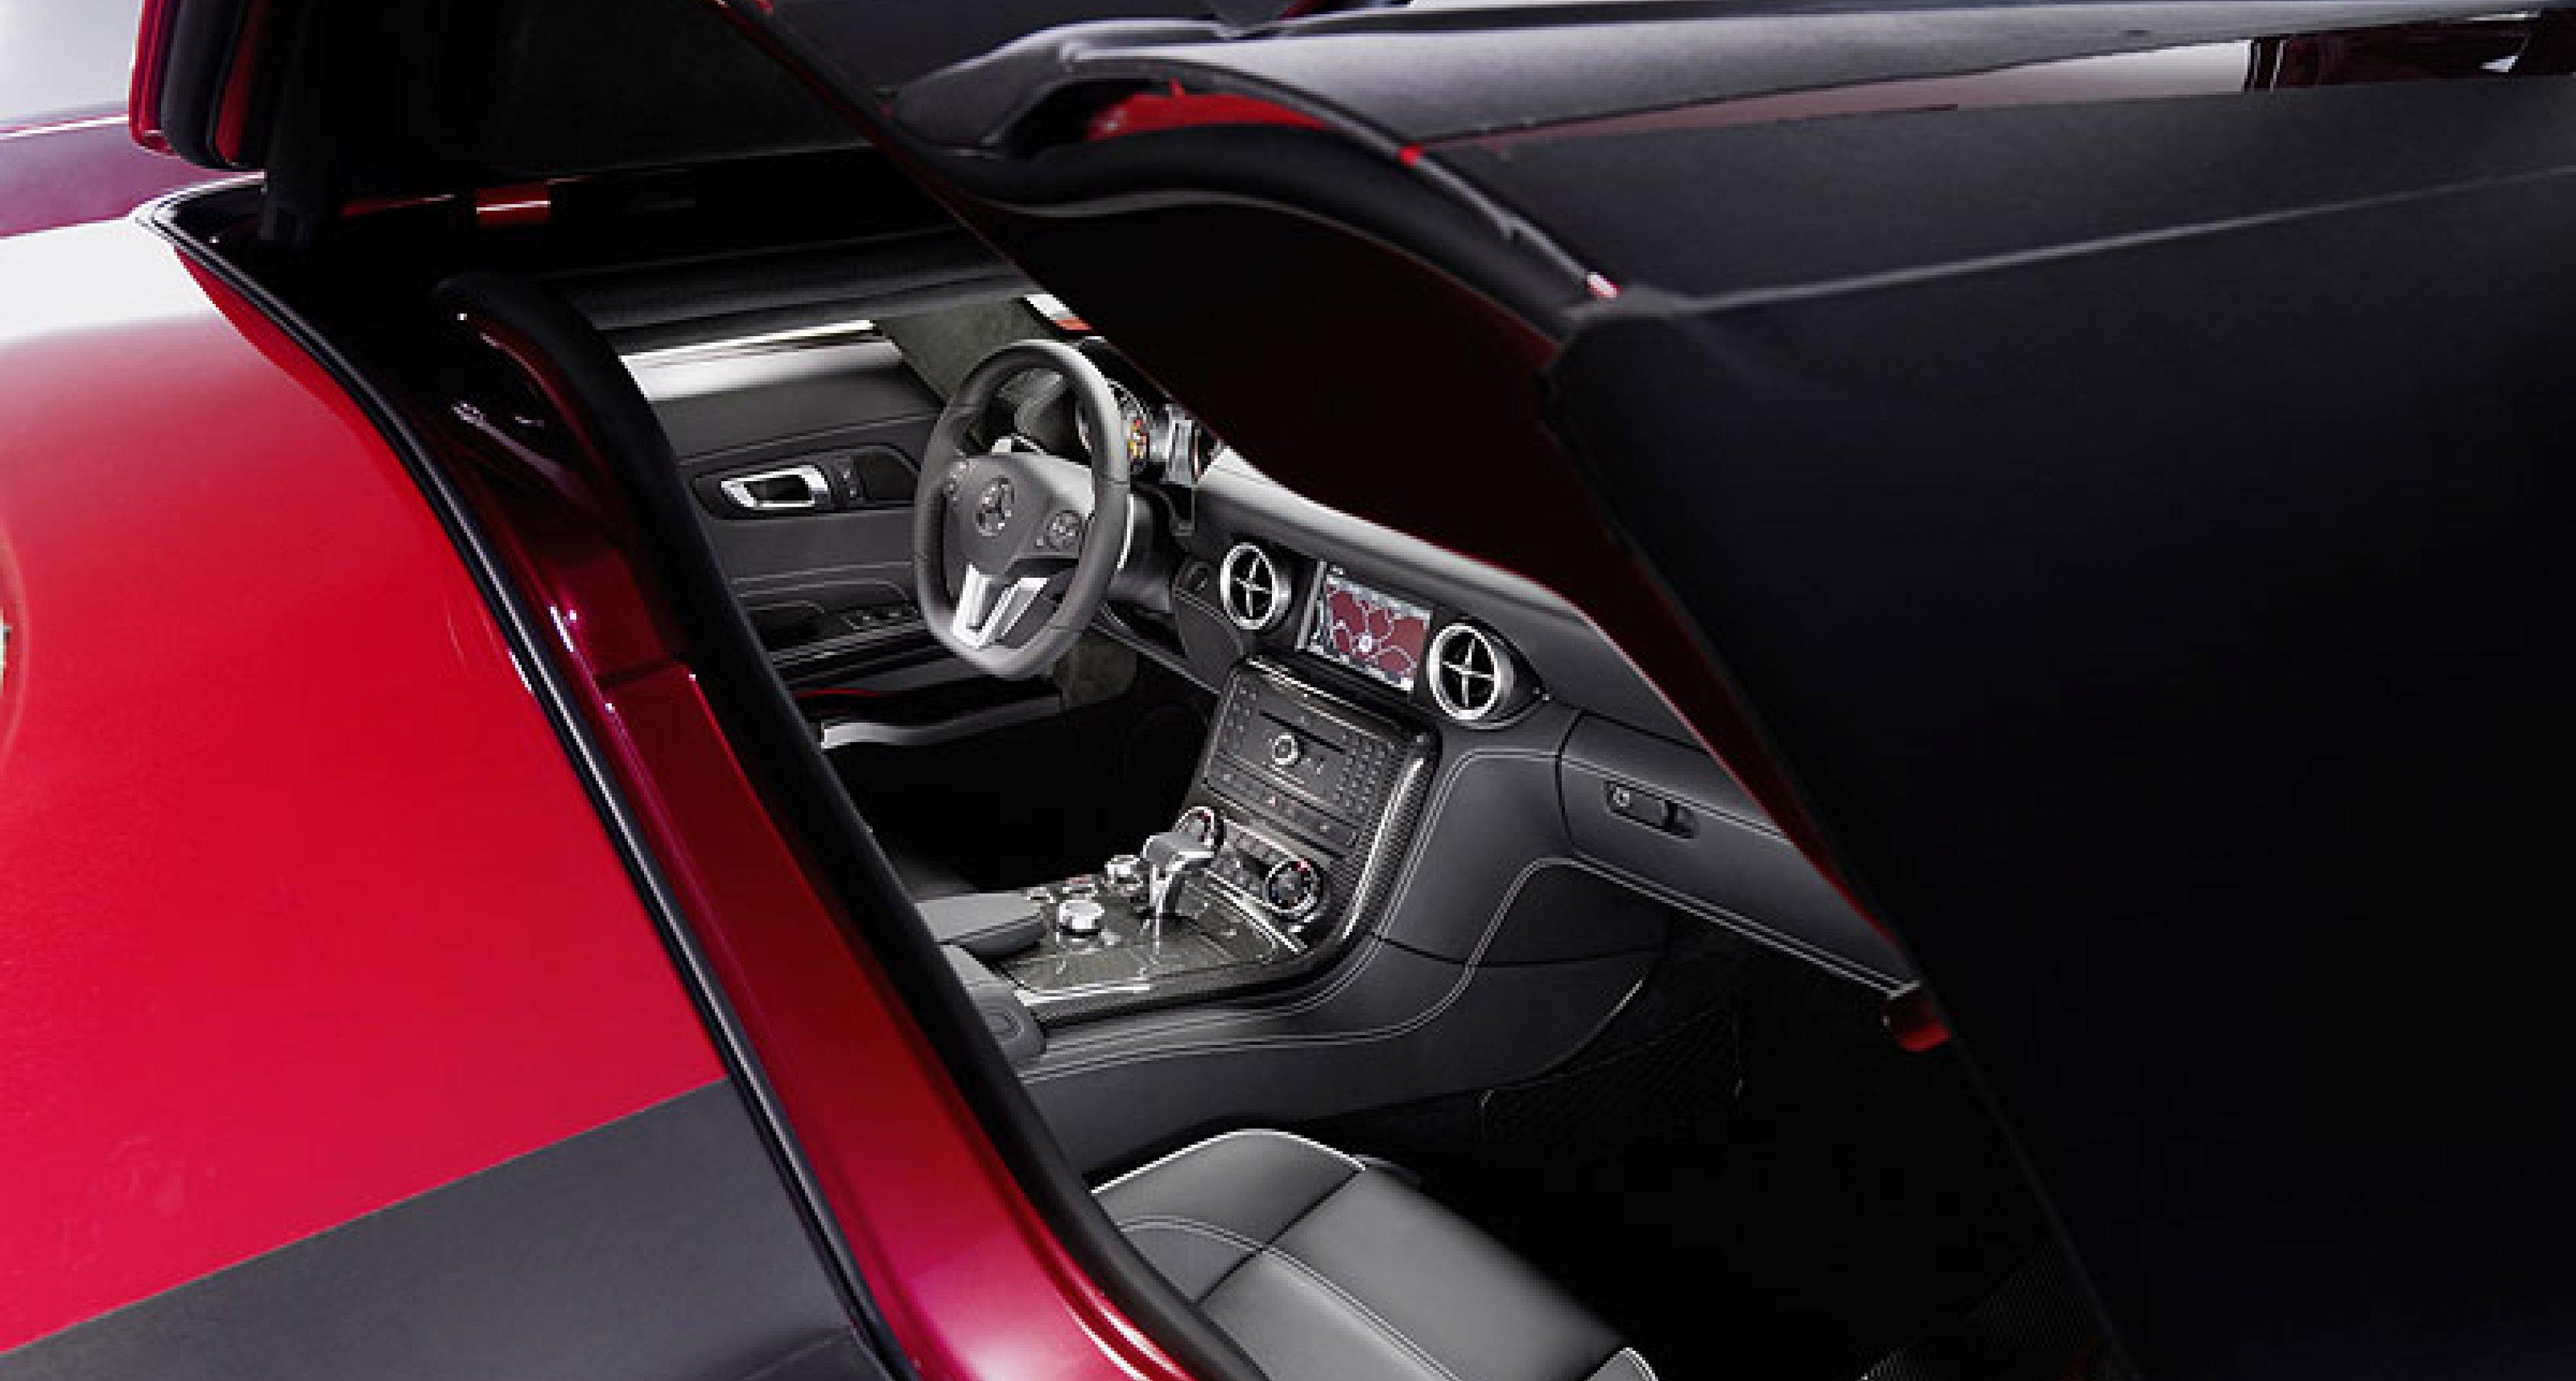 Mercedes-Benz SLS AMG: Das Interieur   Classic Driver Magazine